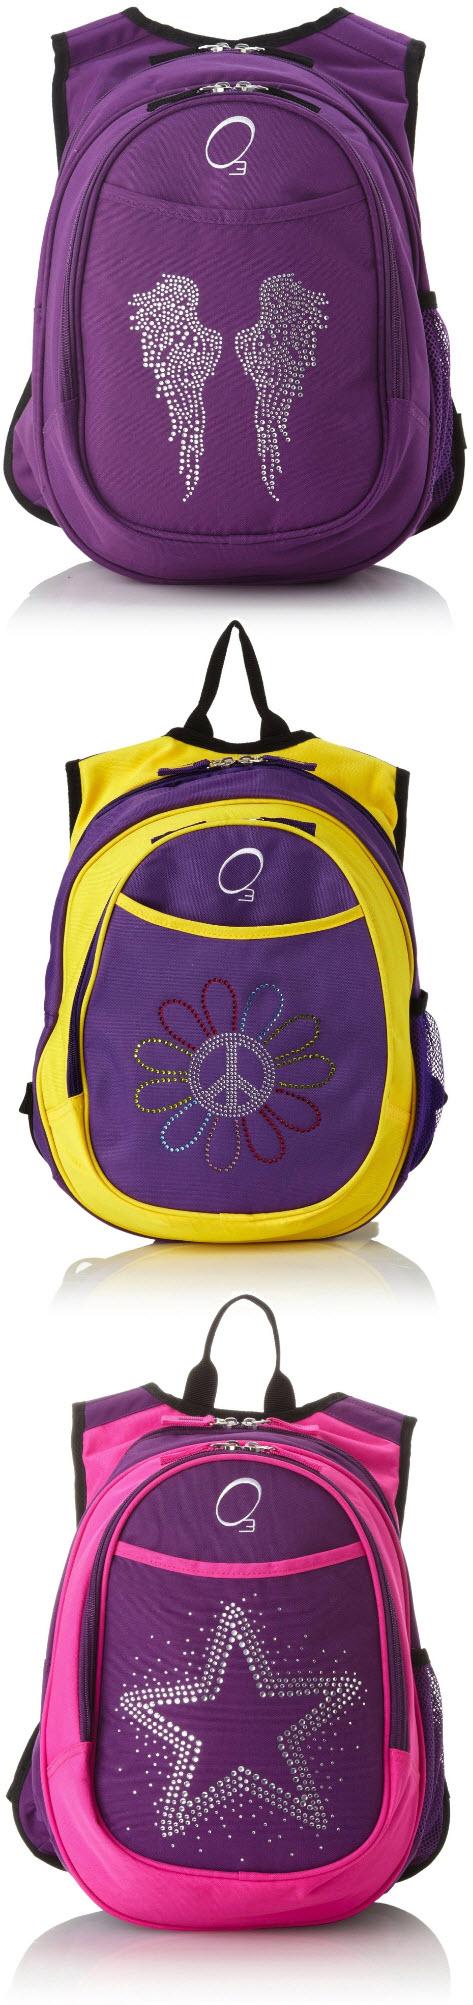 Cute purple backpacks for kids